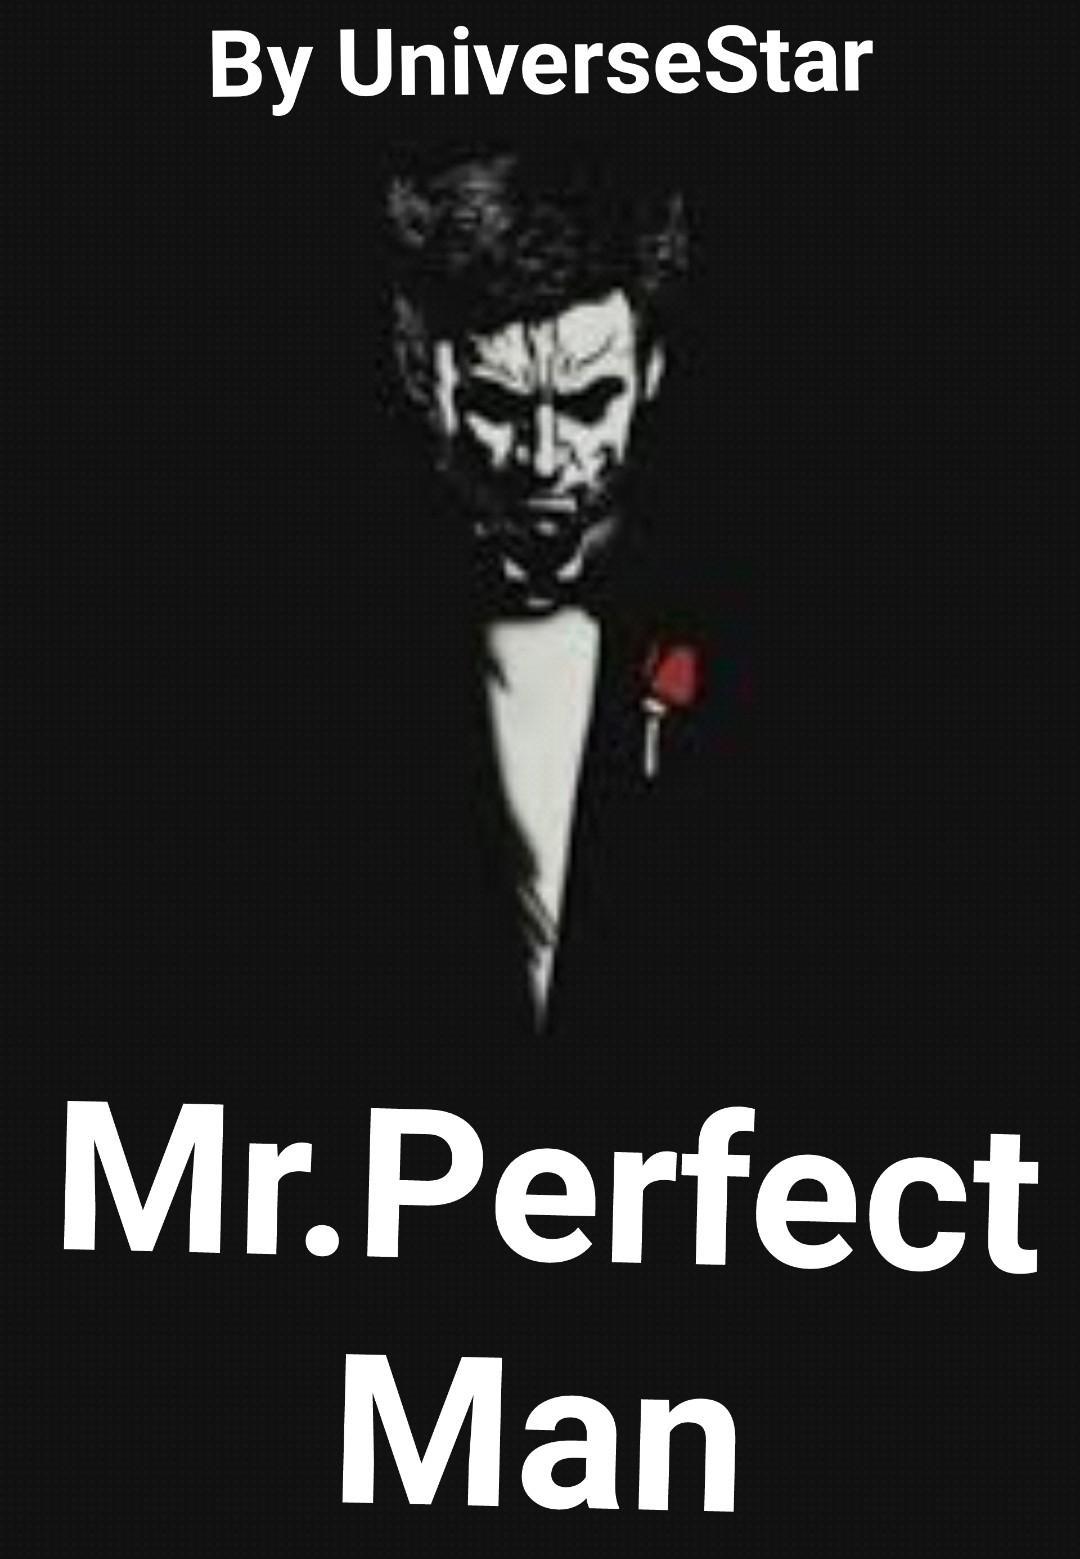 Mr. Perfect Man